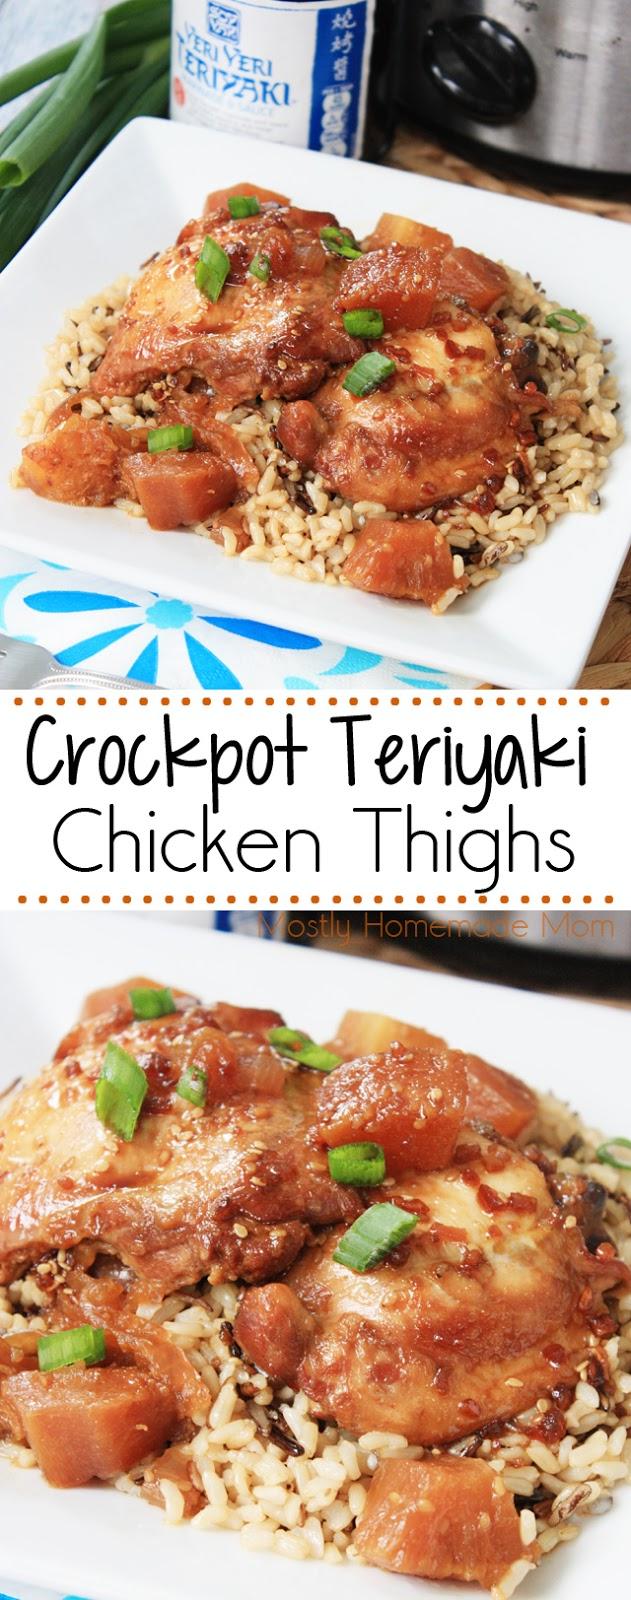 Slow Cooker Teriyaki Chicken Thighs